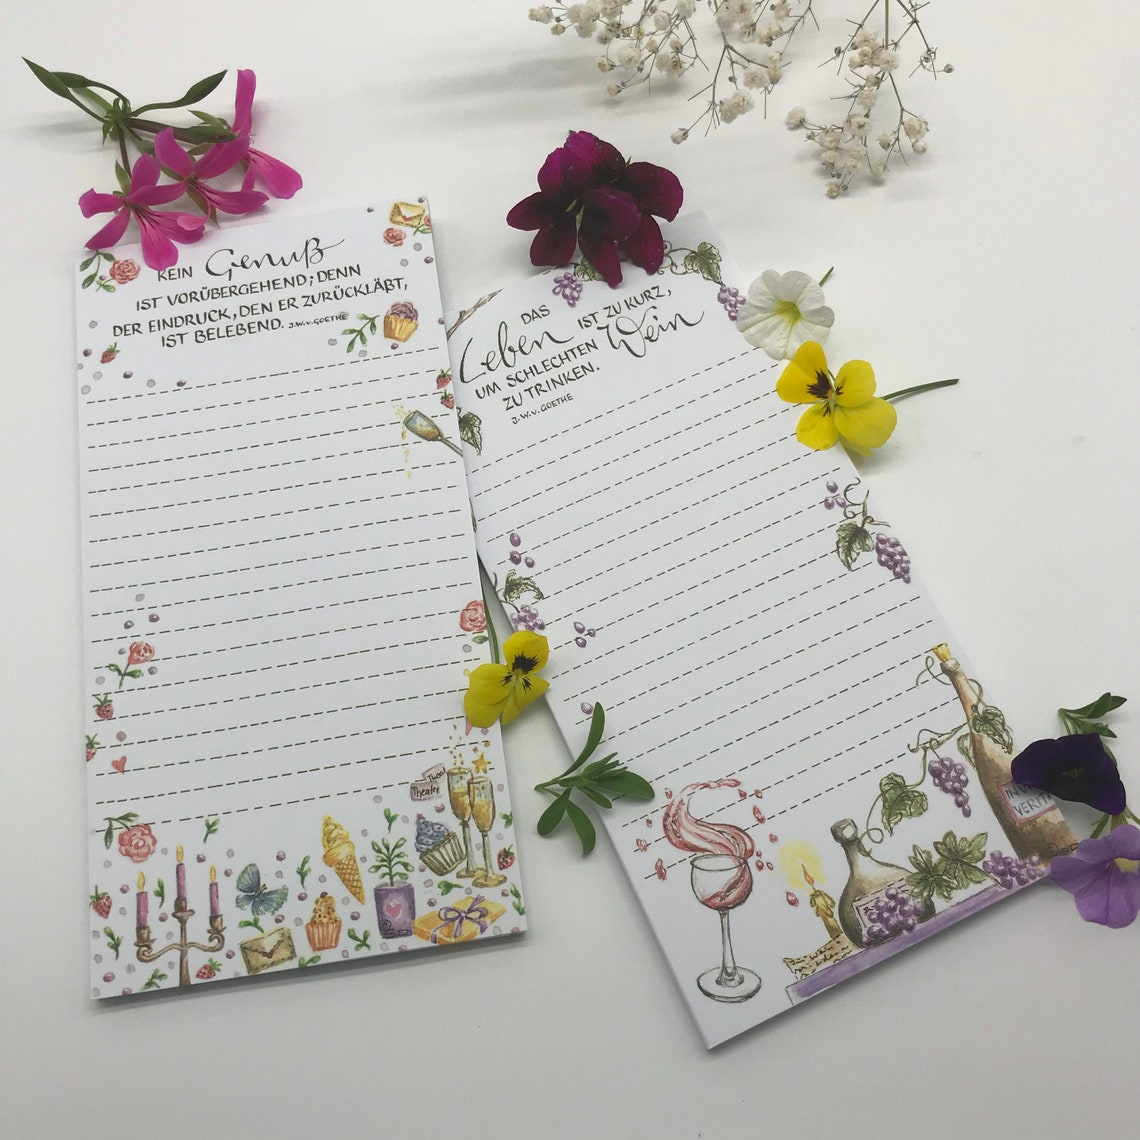 2 teiliges Set Notizblock/ Schreibblock DIN lang